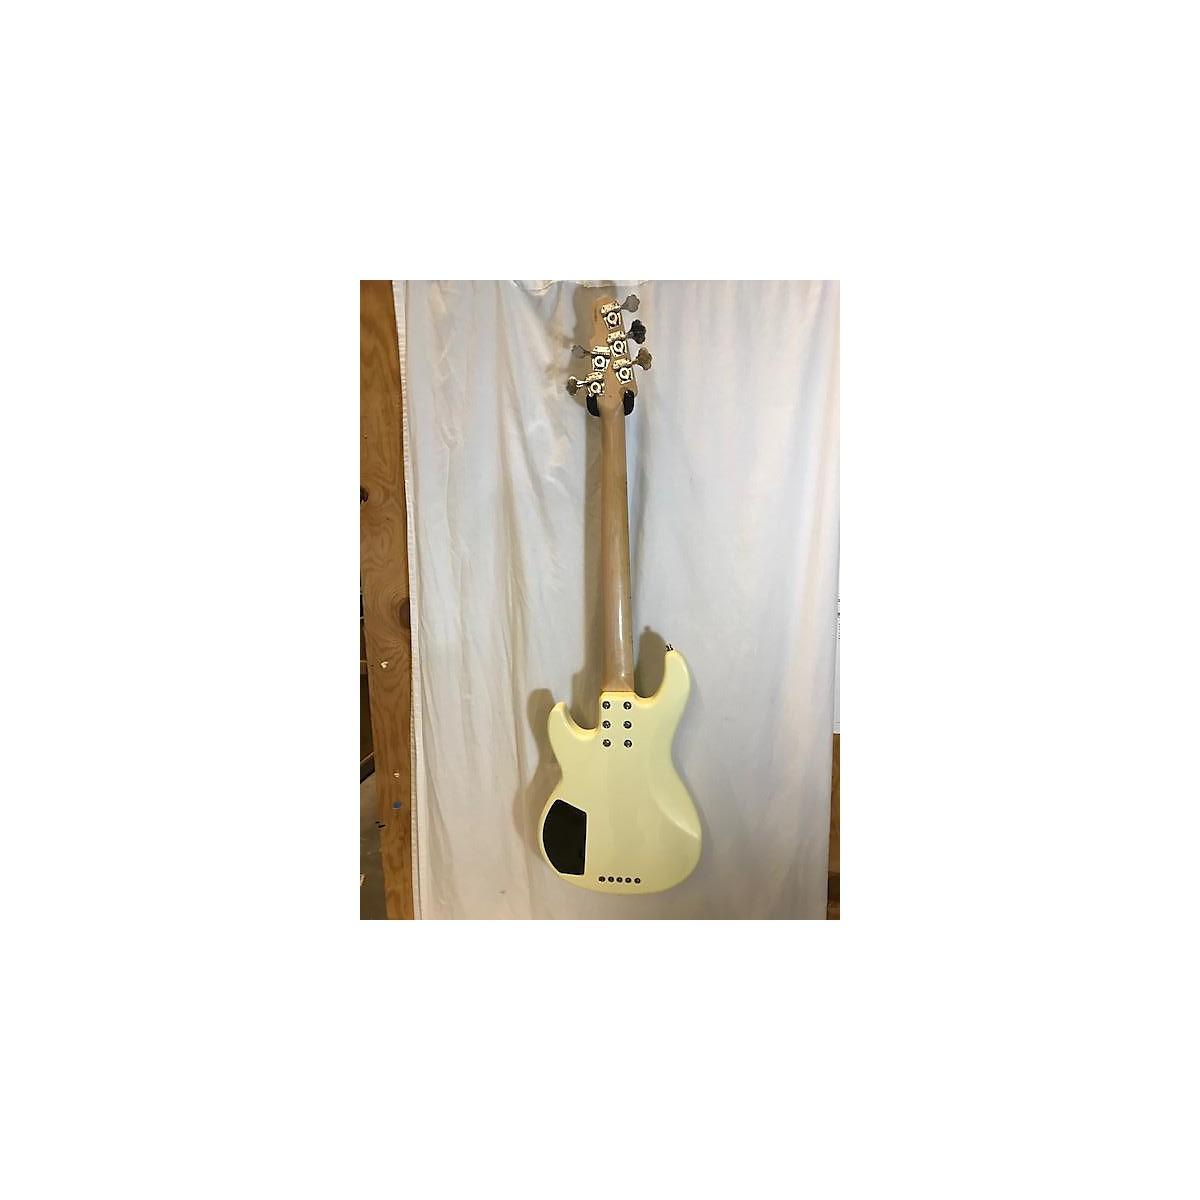 G&L USA L2500 5 String Electric Bass Guitar